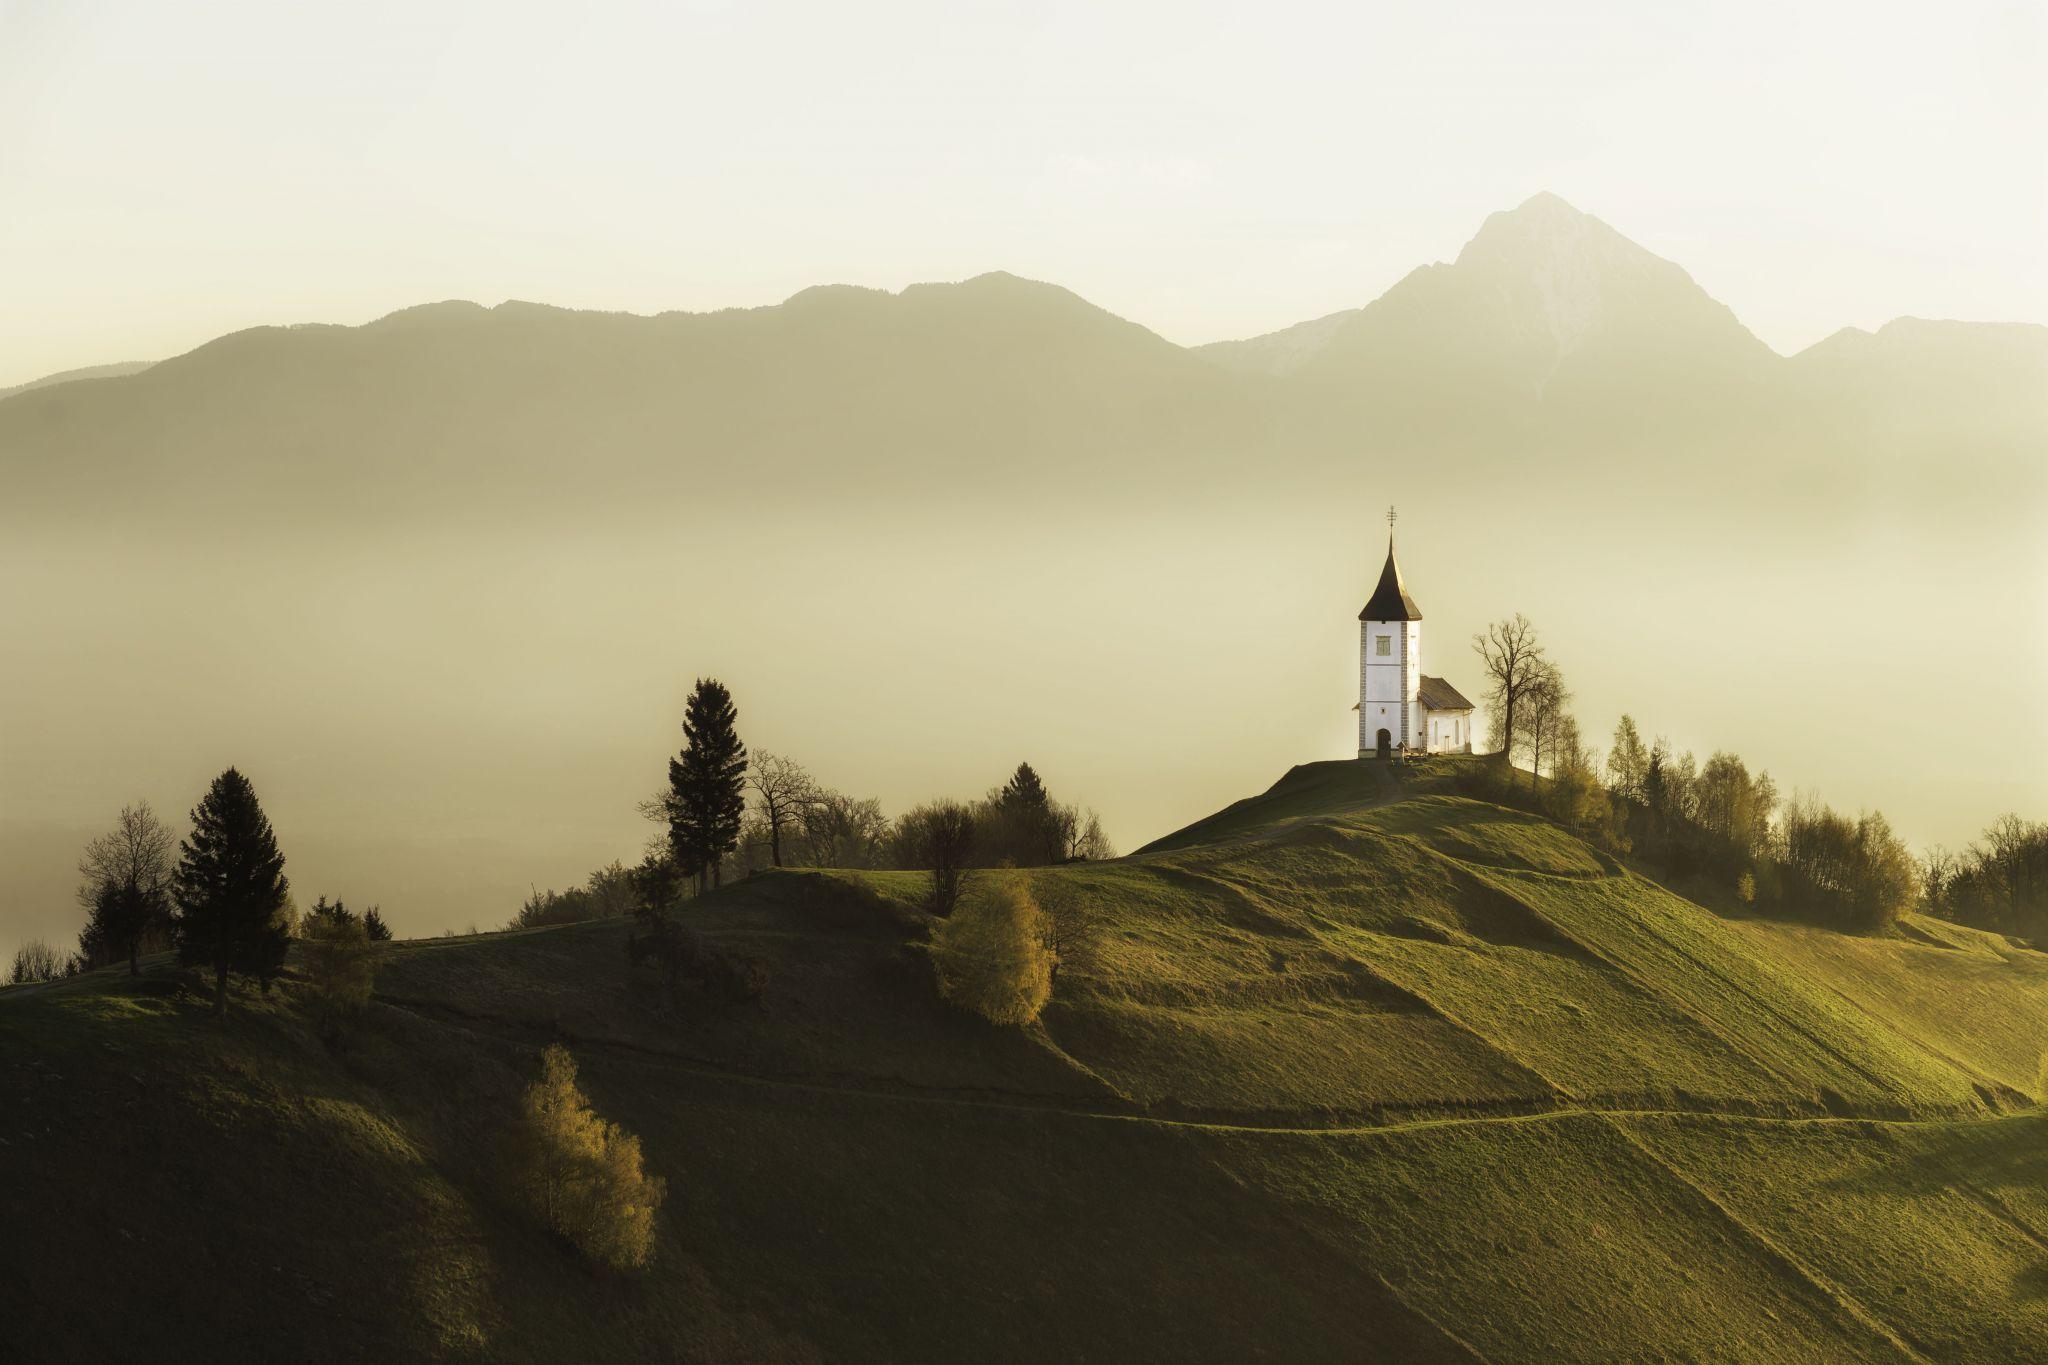 The Curch of St. Primoz, Jamnik, Slovenia